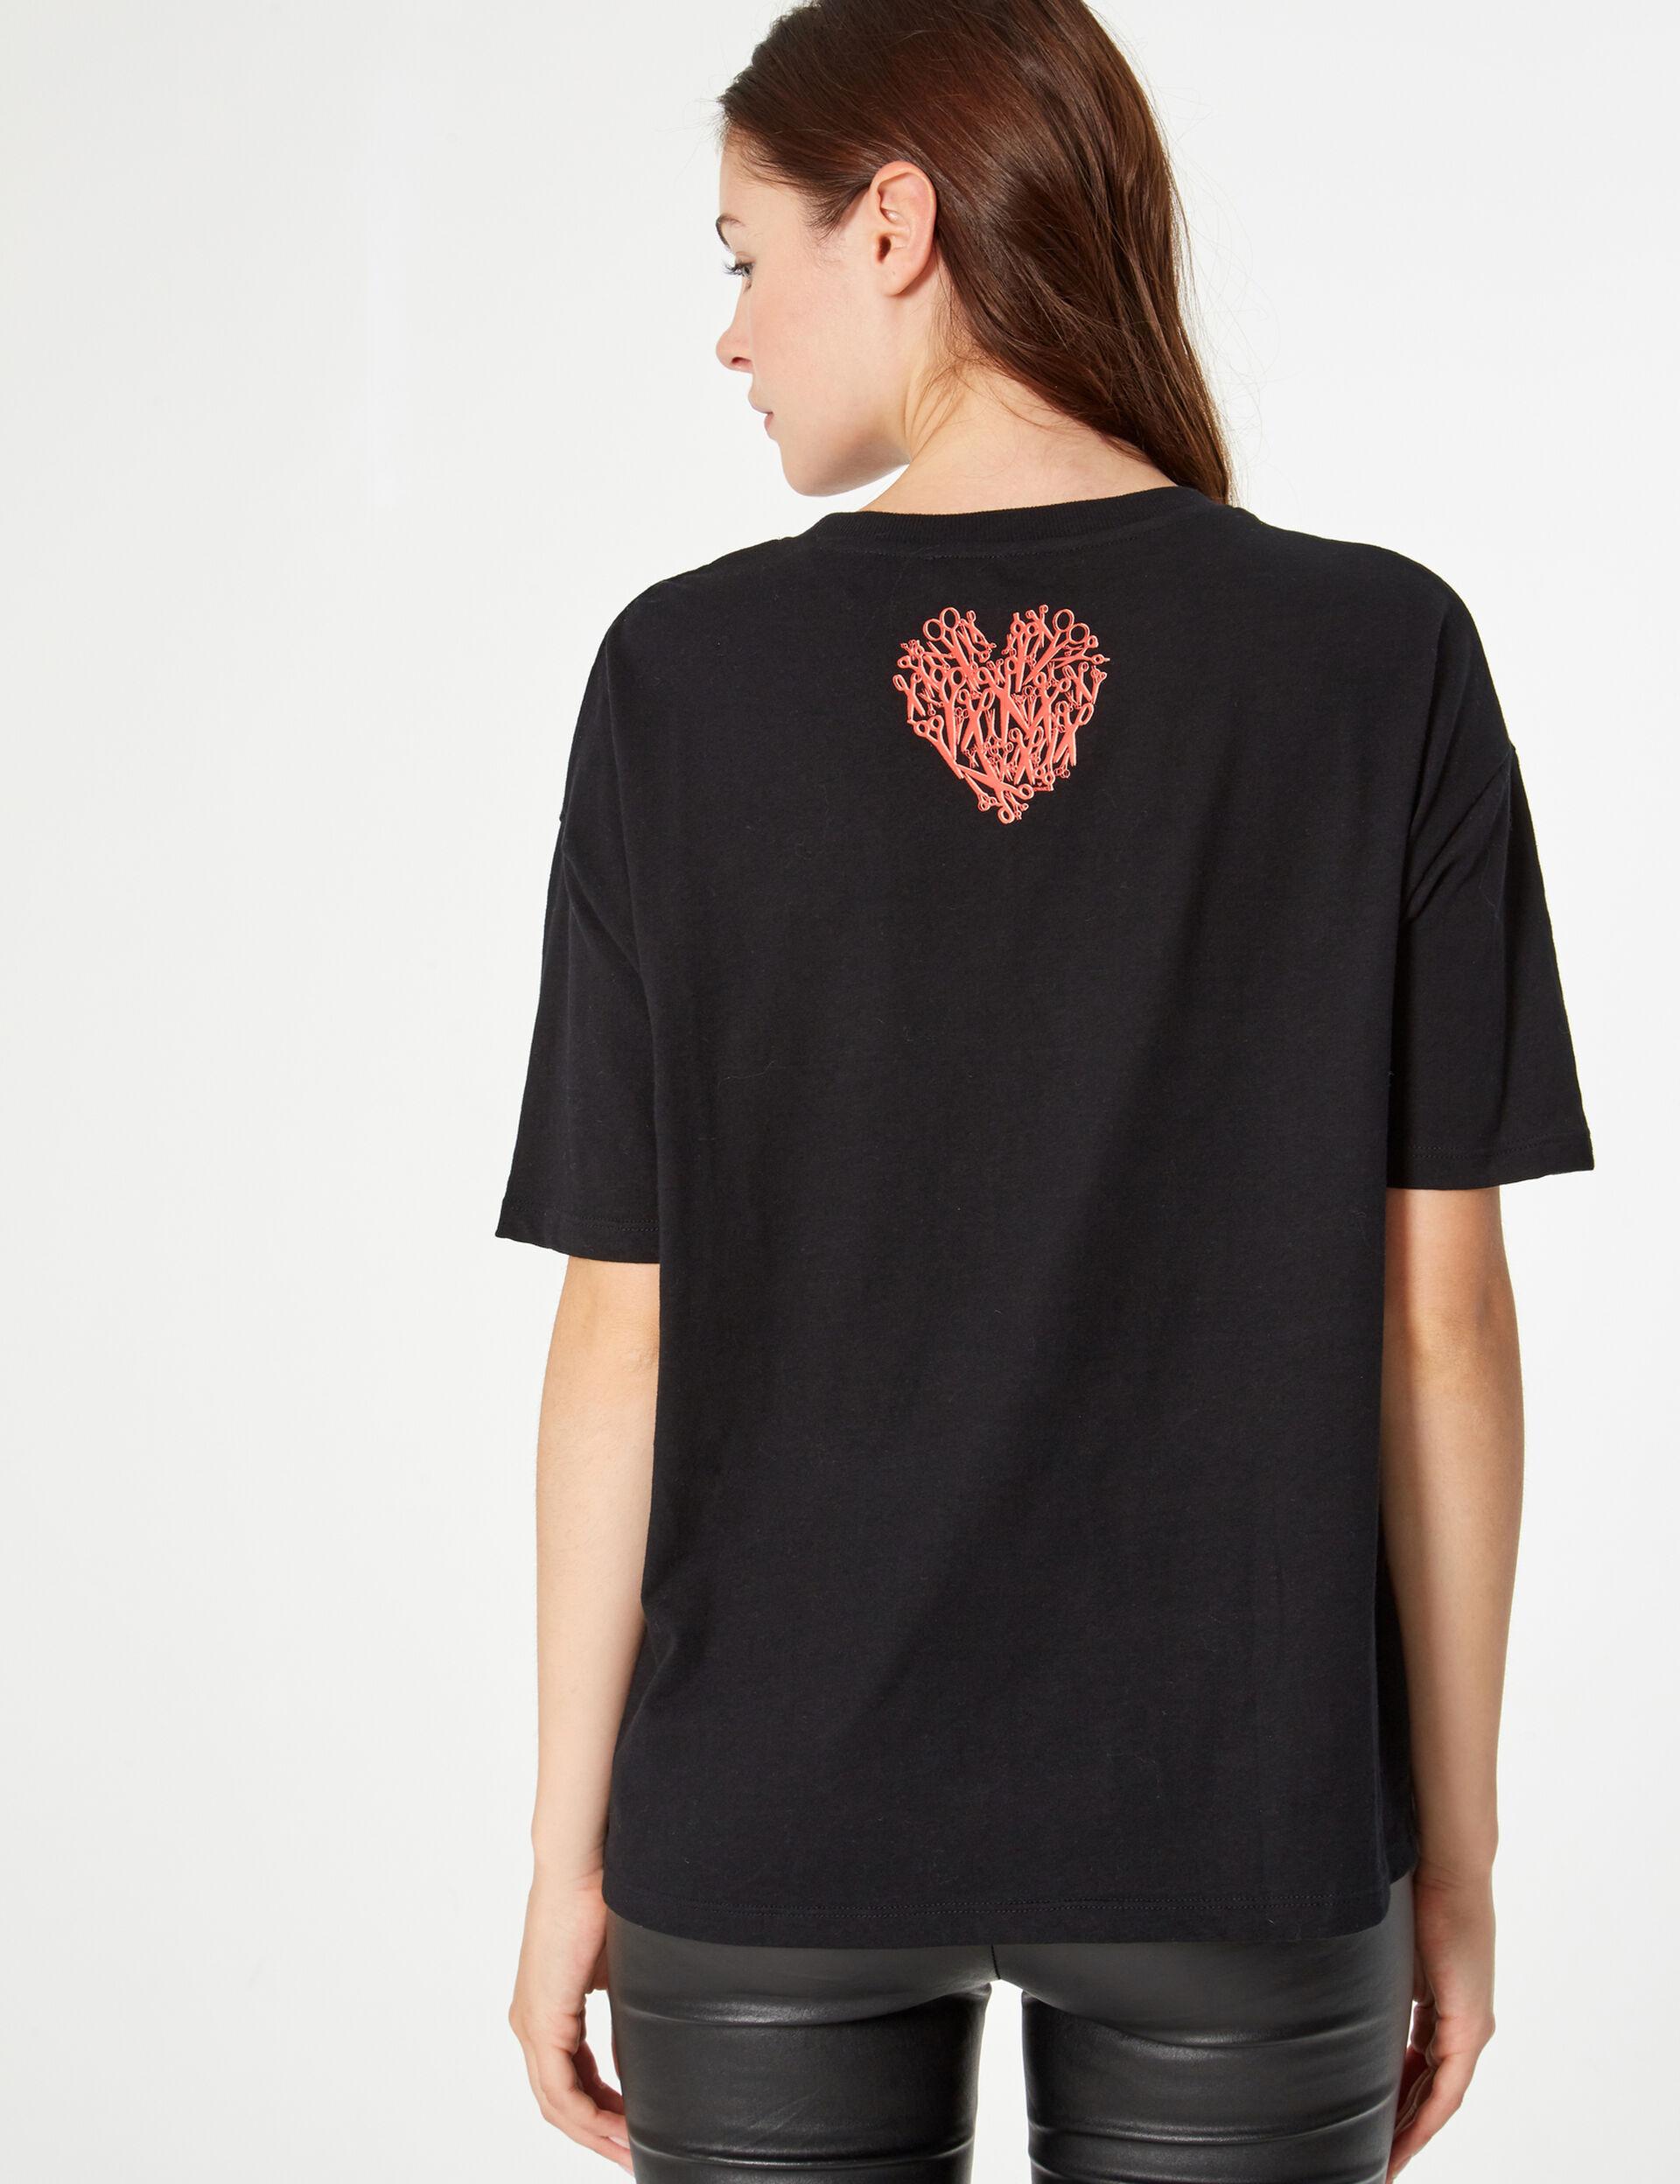 Collab t-shirt